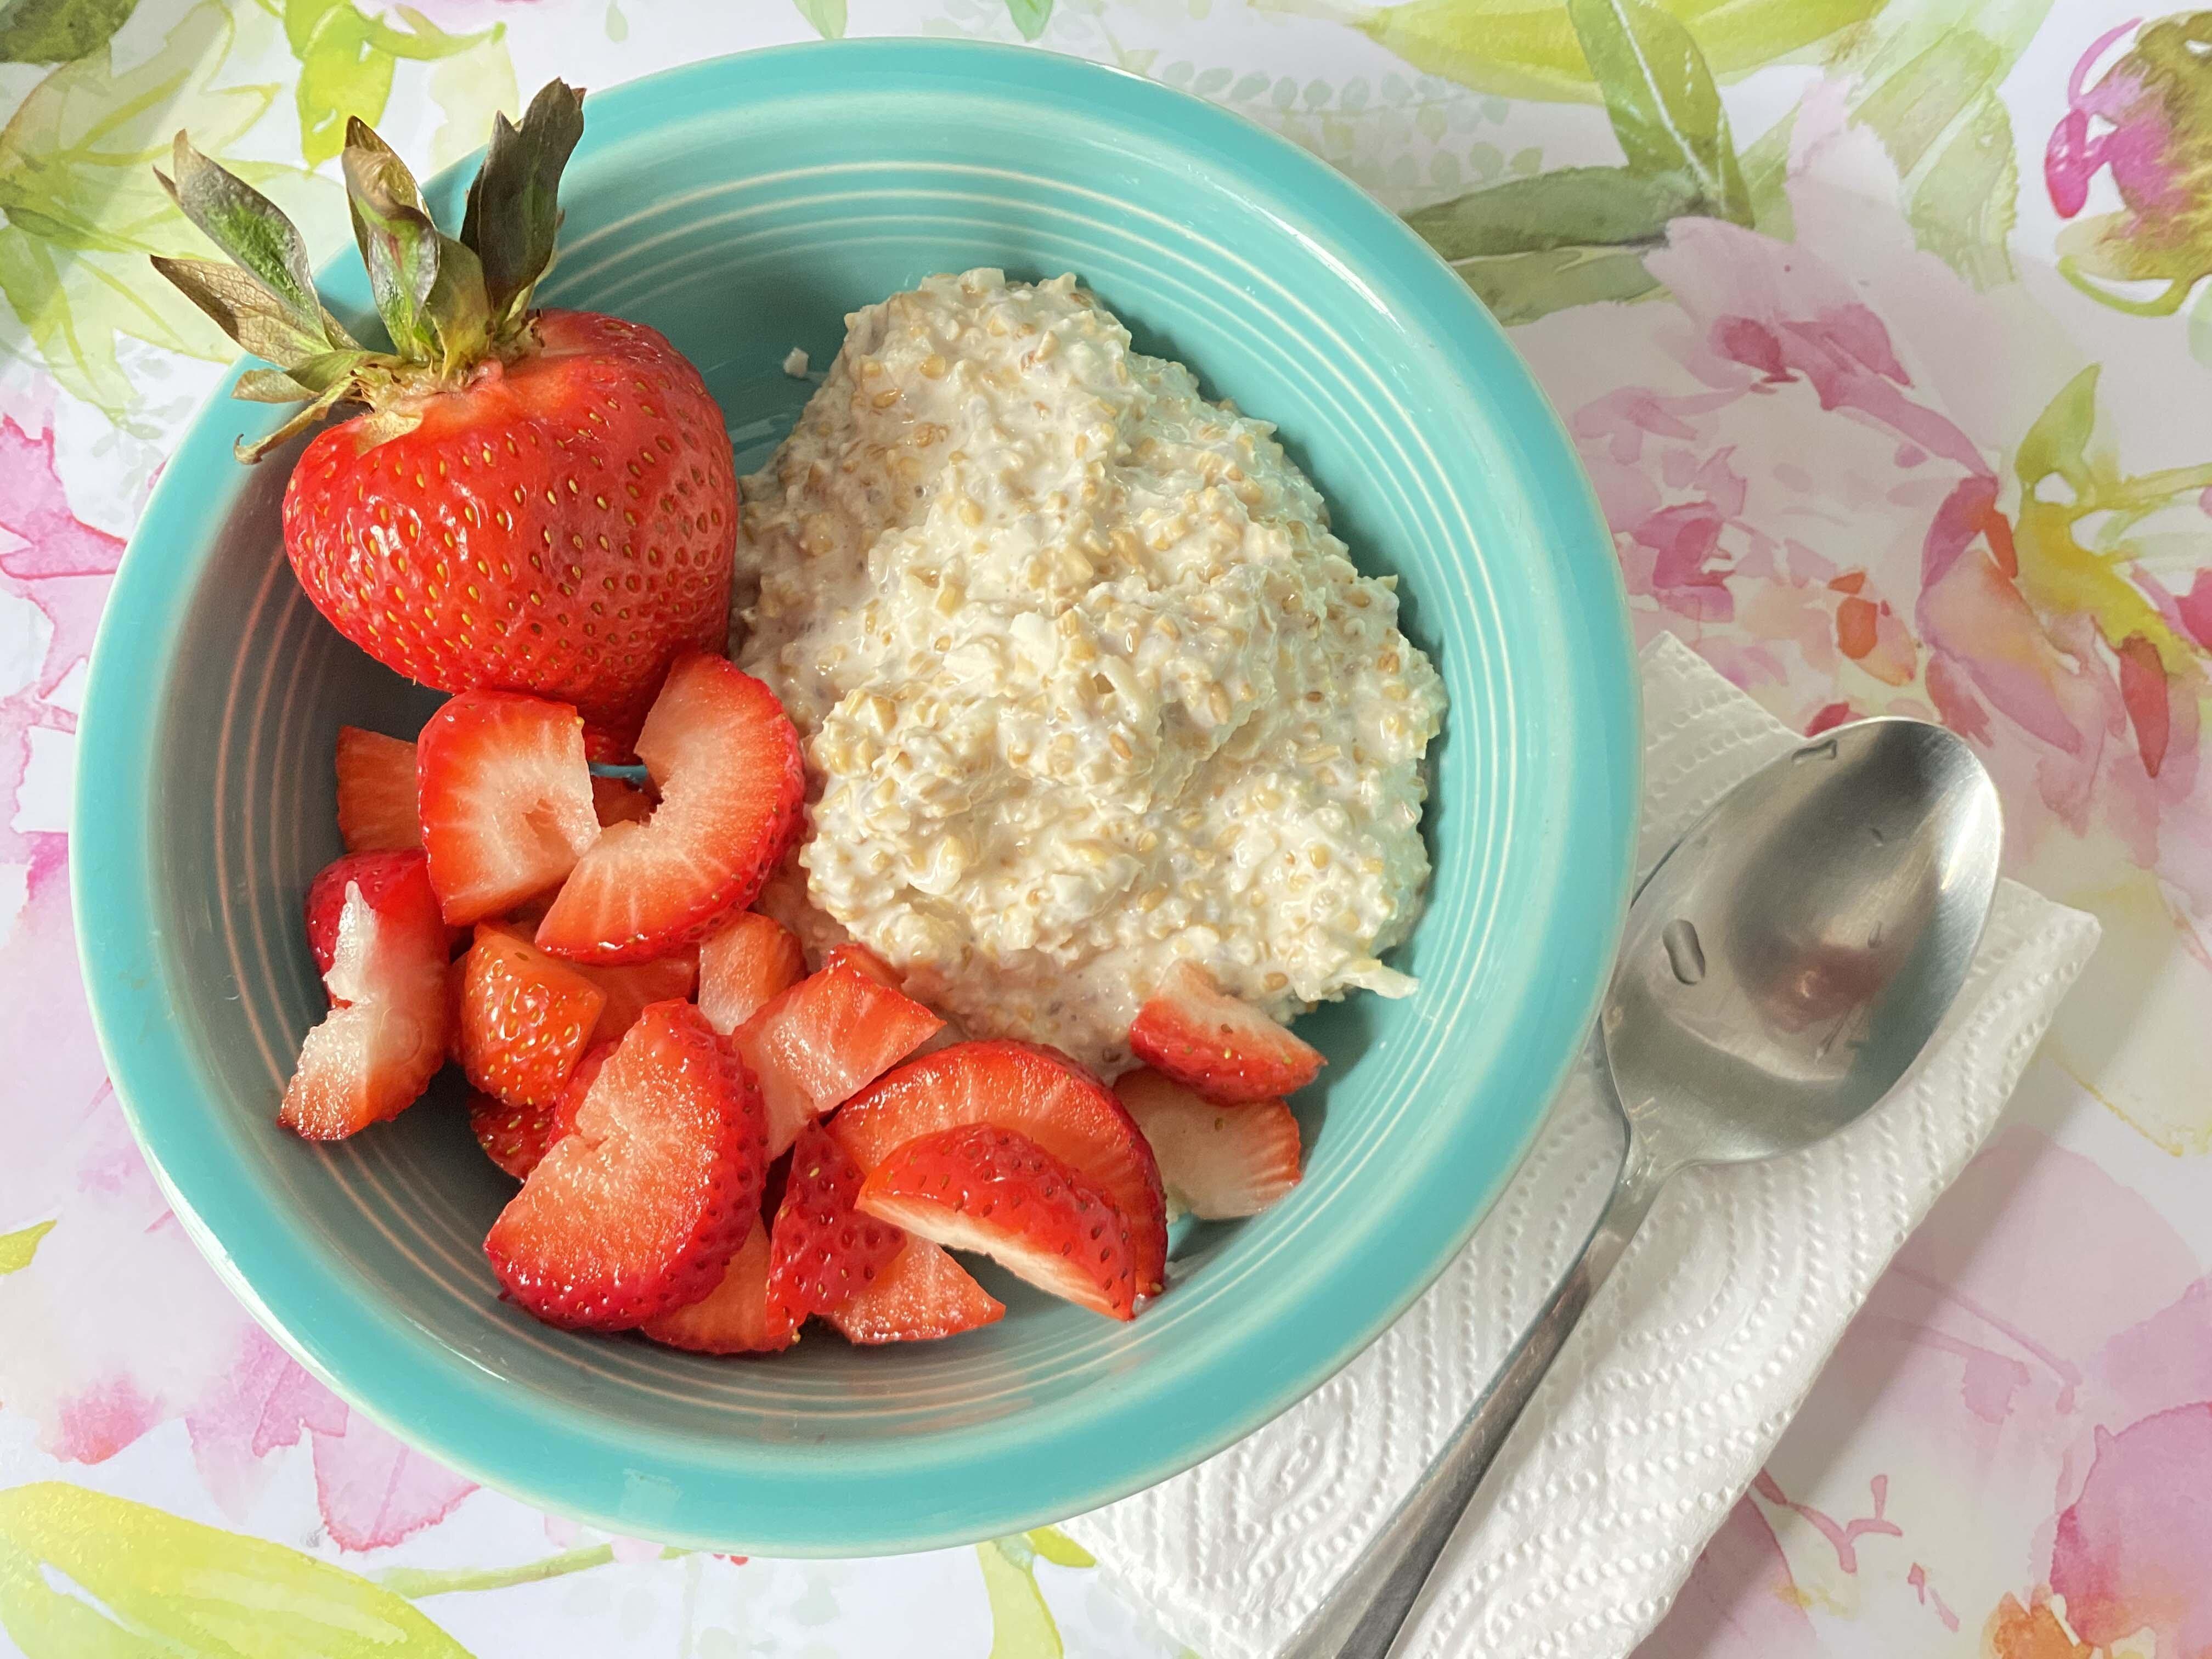 bircher muesli swiss oatmeal recipe